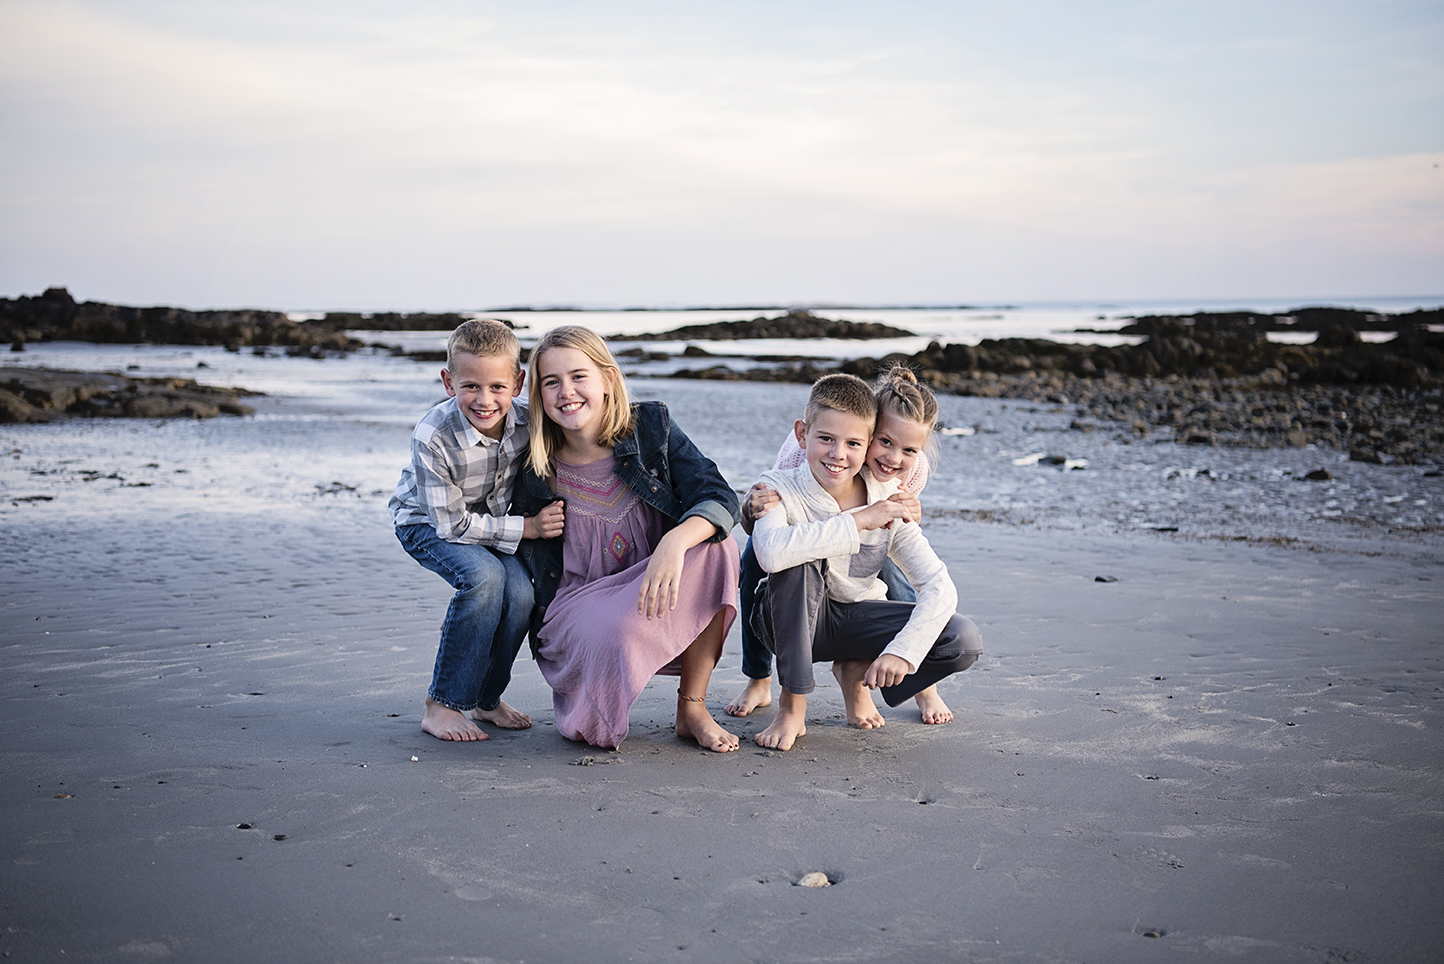 Childrens-Photographer-NH.jpg